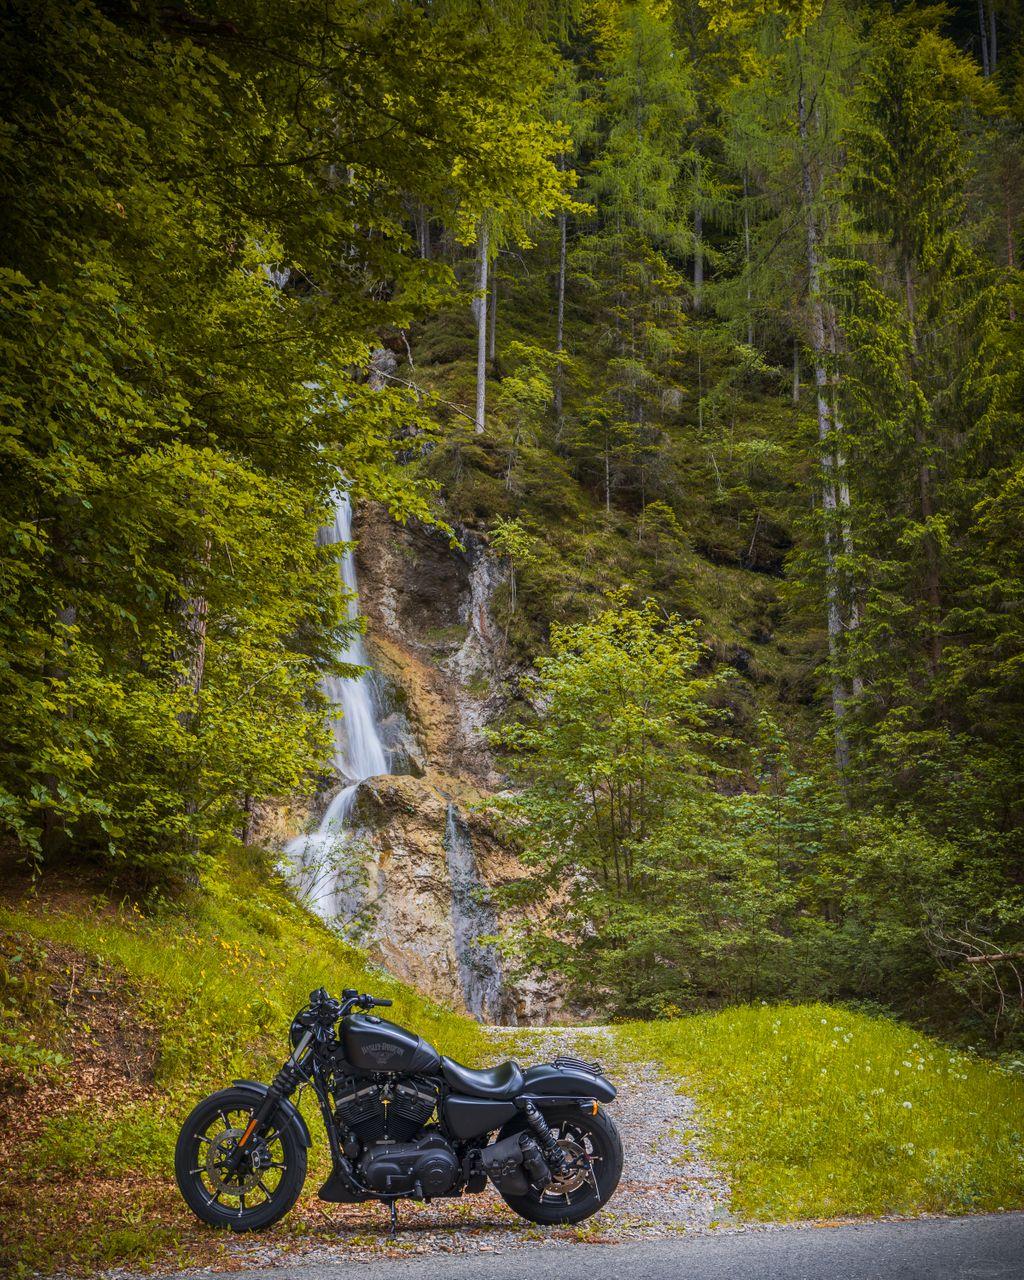 Waterfall Stockenboi and my Harley Davidson Sportster Iron 883 - XL883N